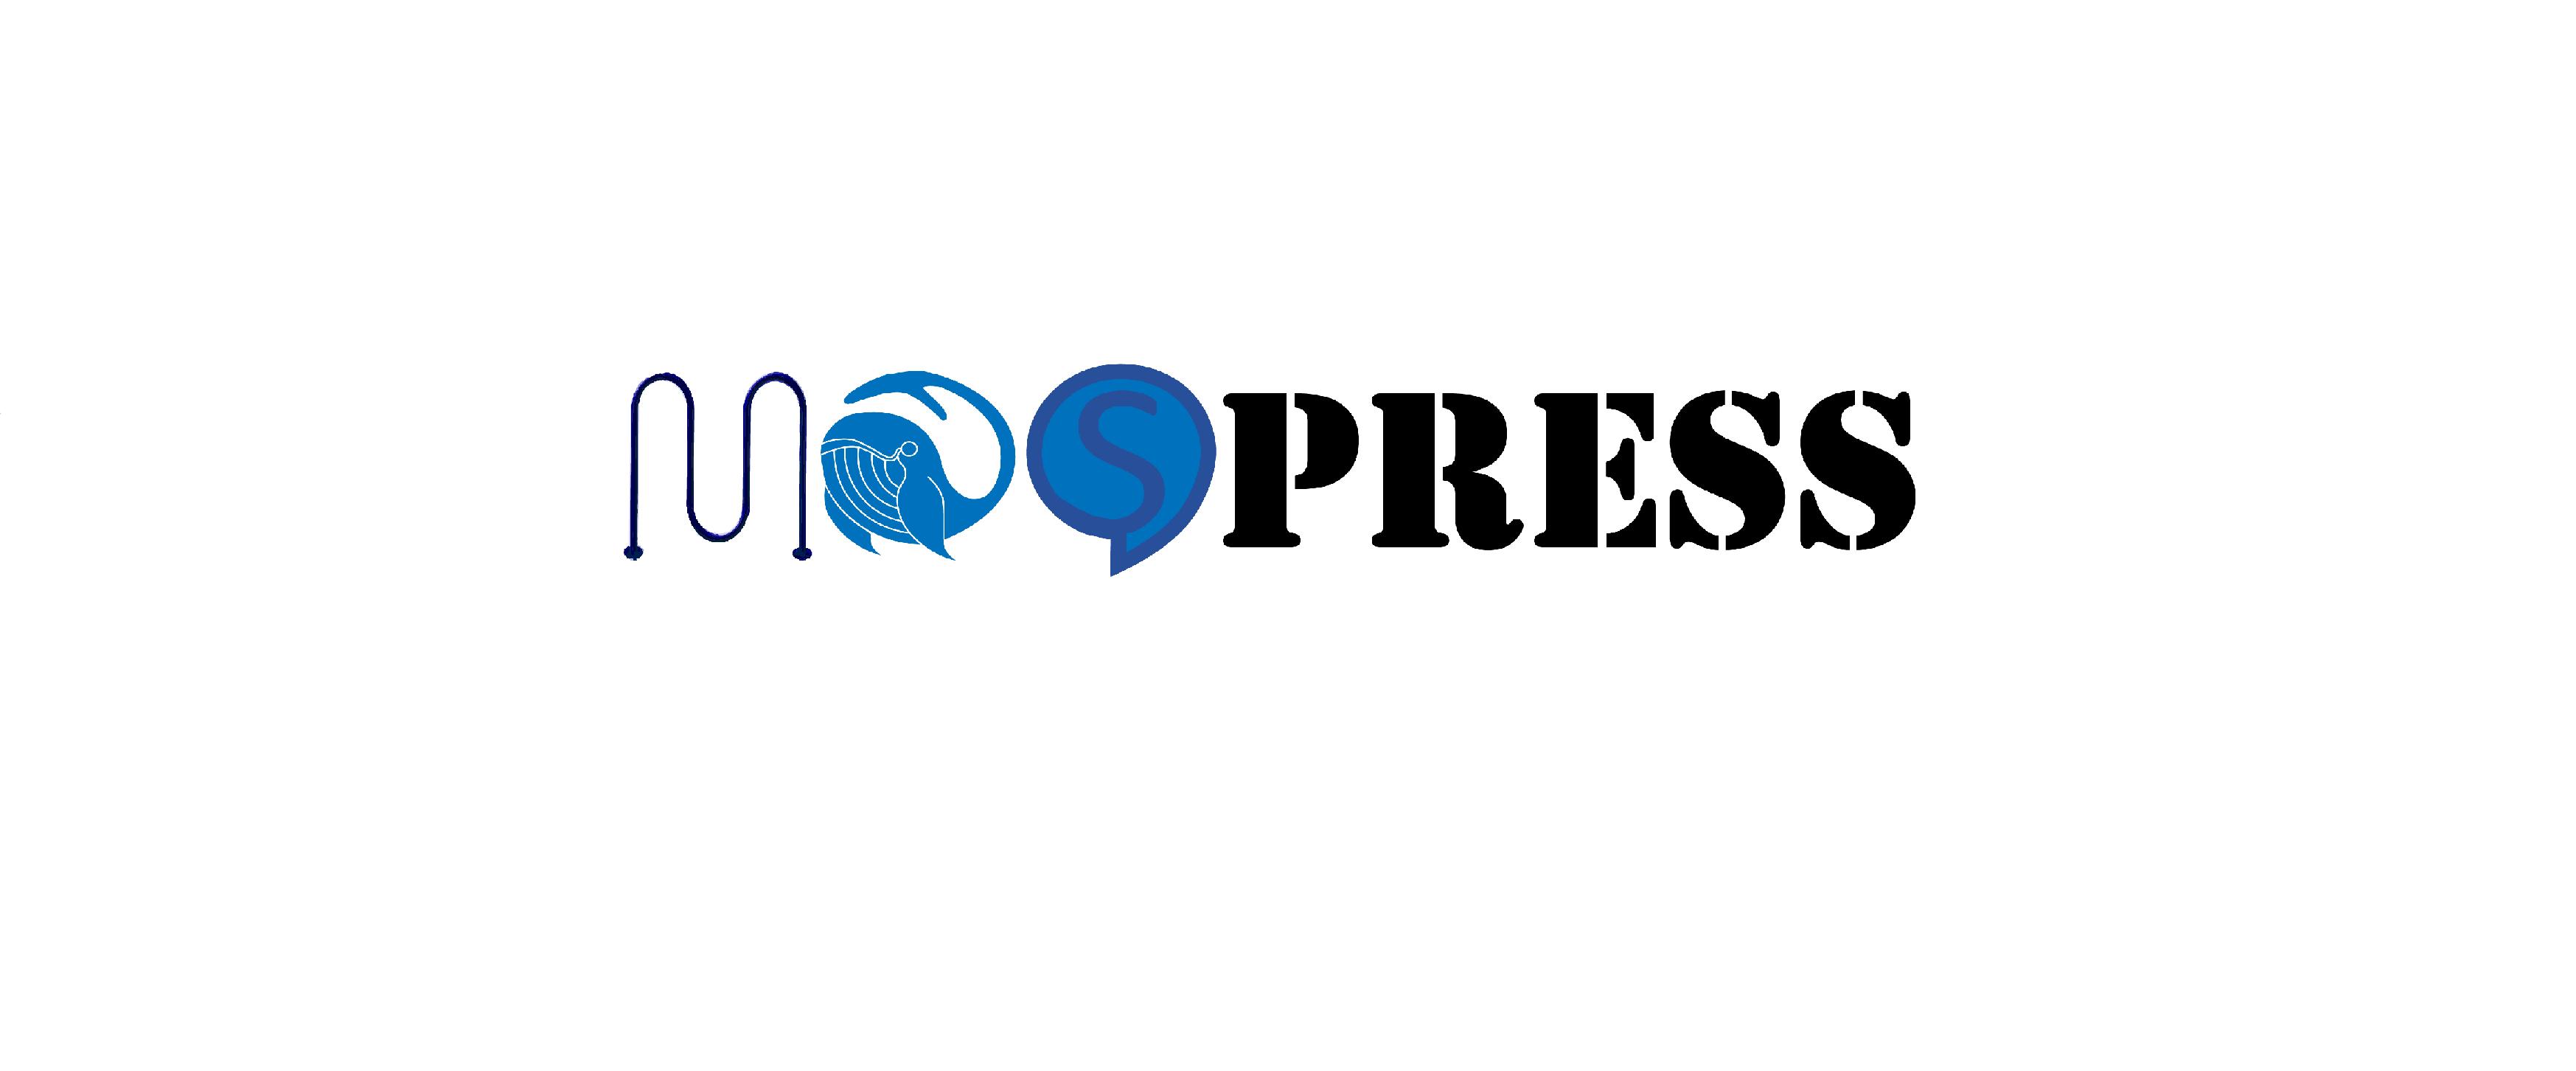 MOSPRESS LOGO test 2